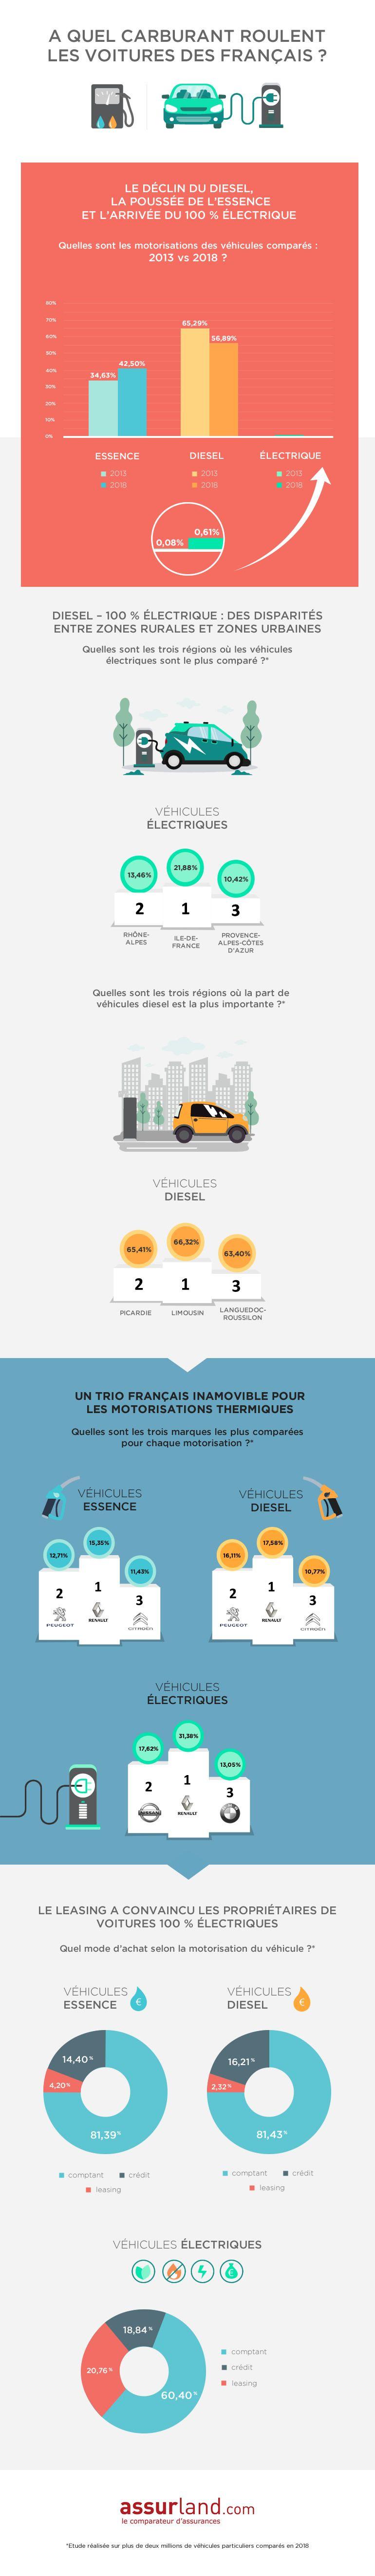 infographie-auto-carburant-assurland